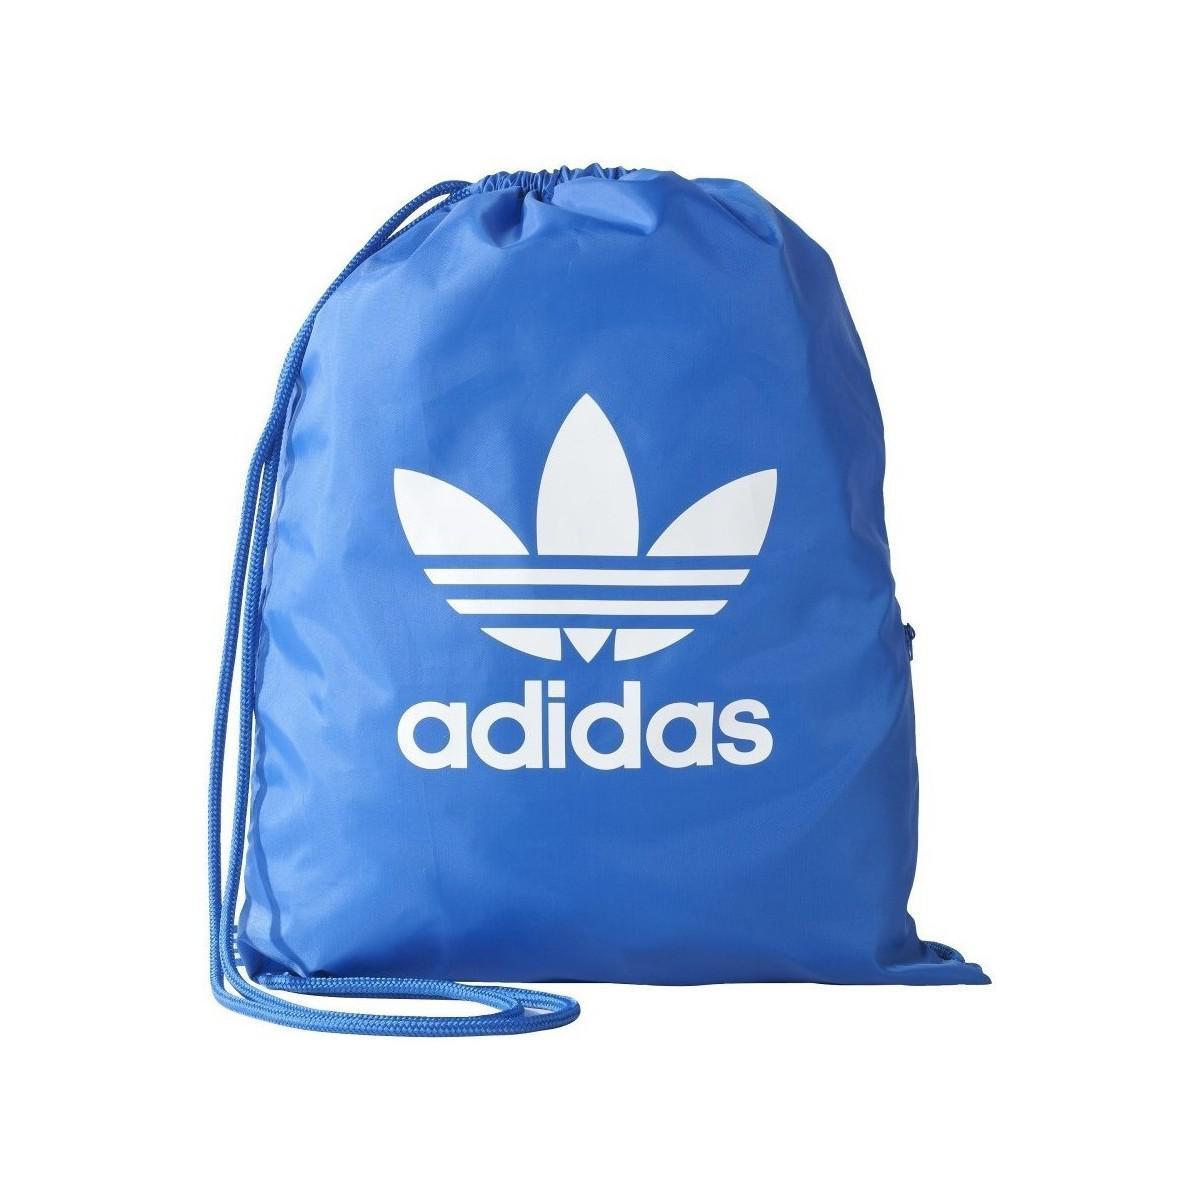 Adidas - Blue Gymsack Trefoil Women s Bag In Multicolour - Lyst. View  Fullscreen 0aea285e368eb